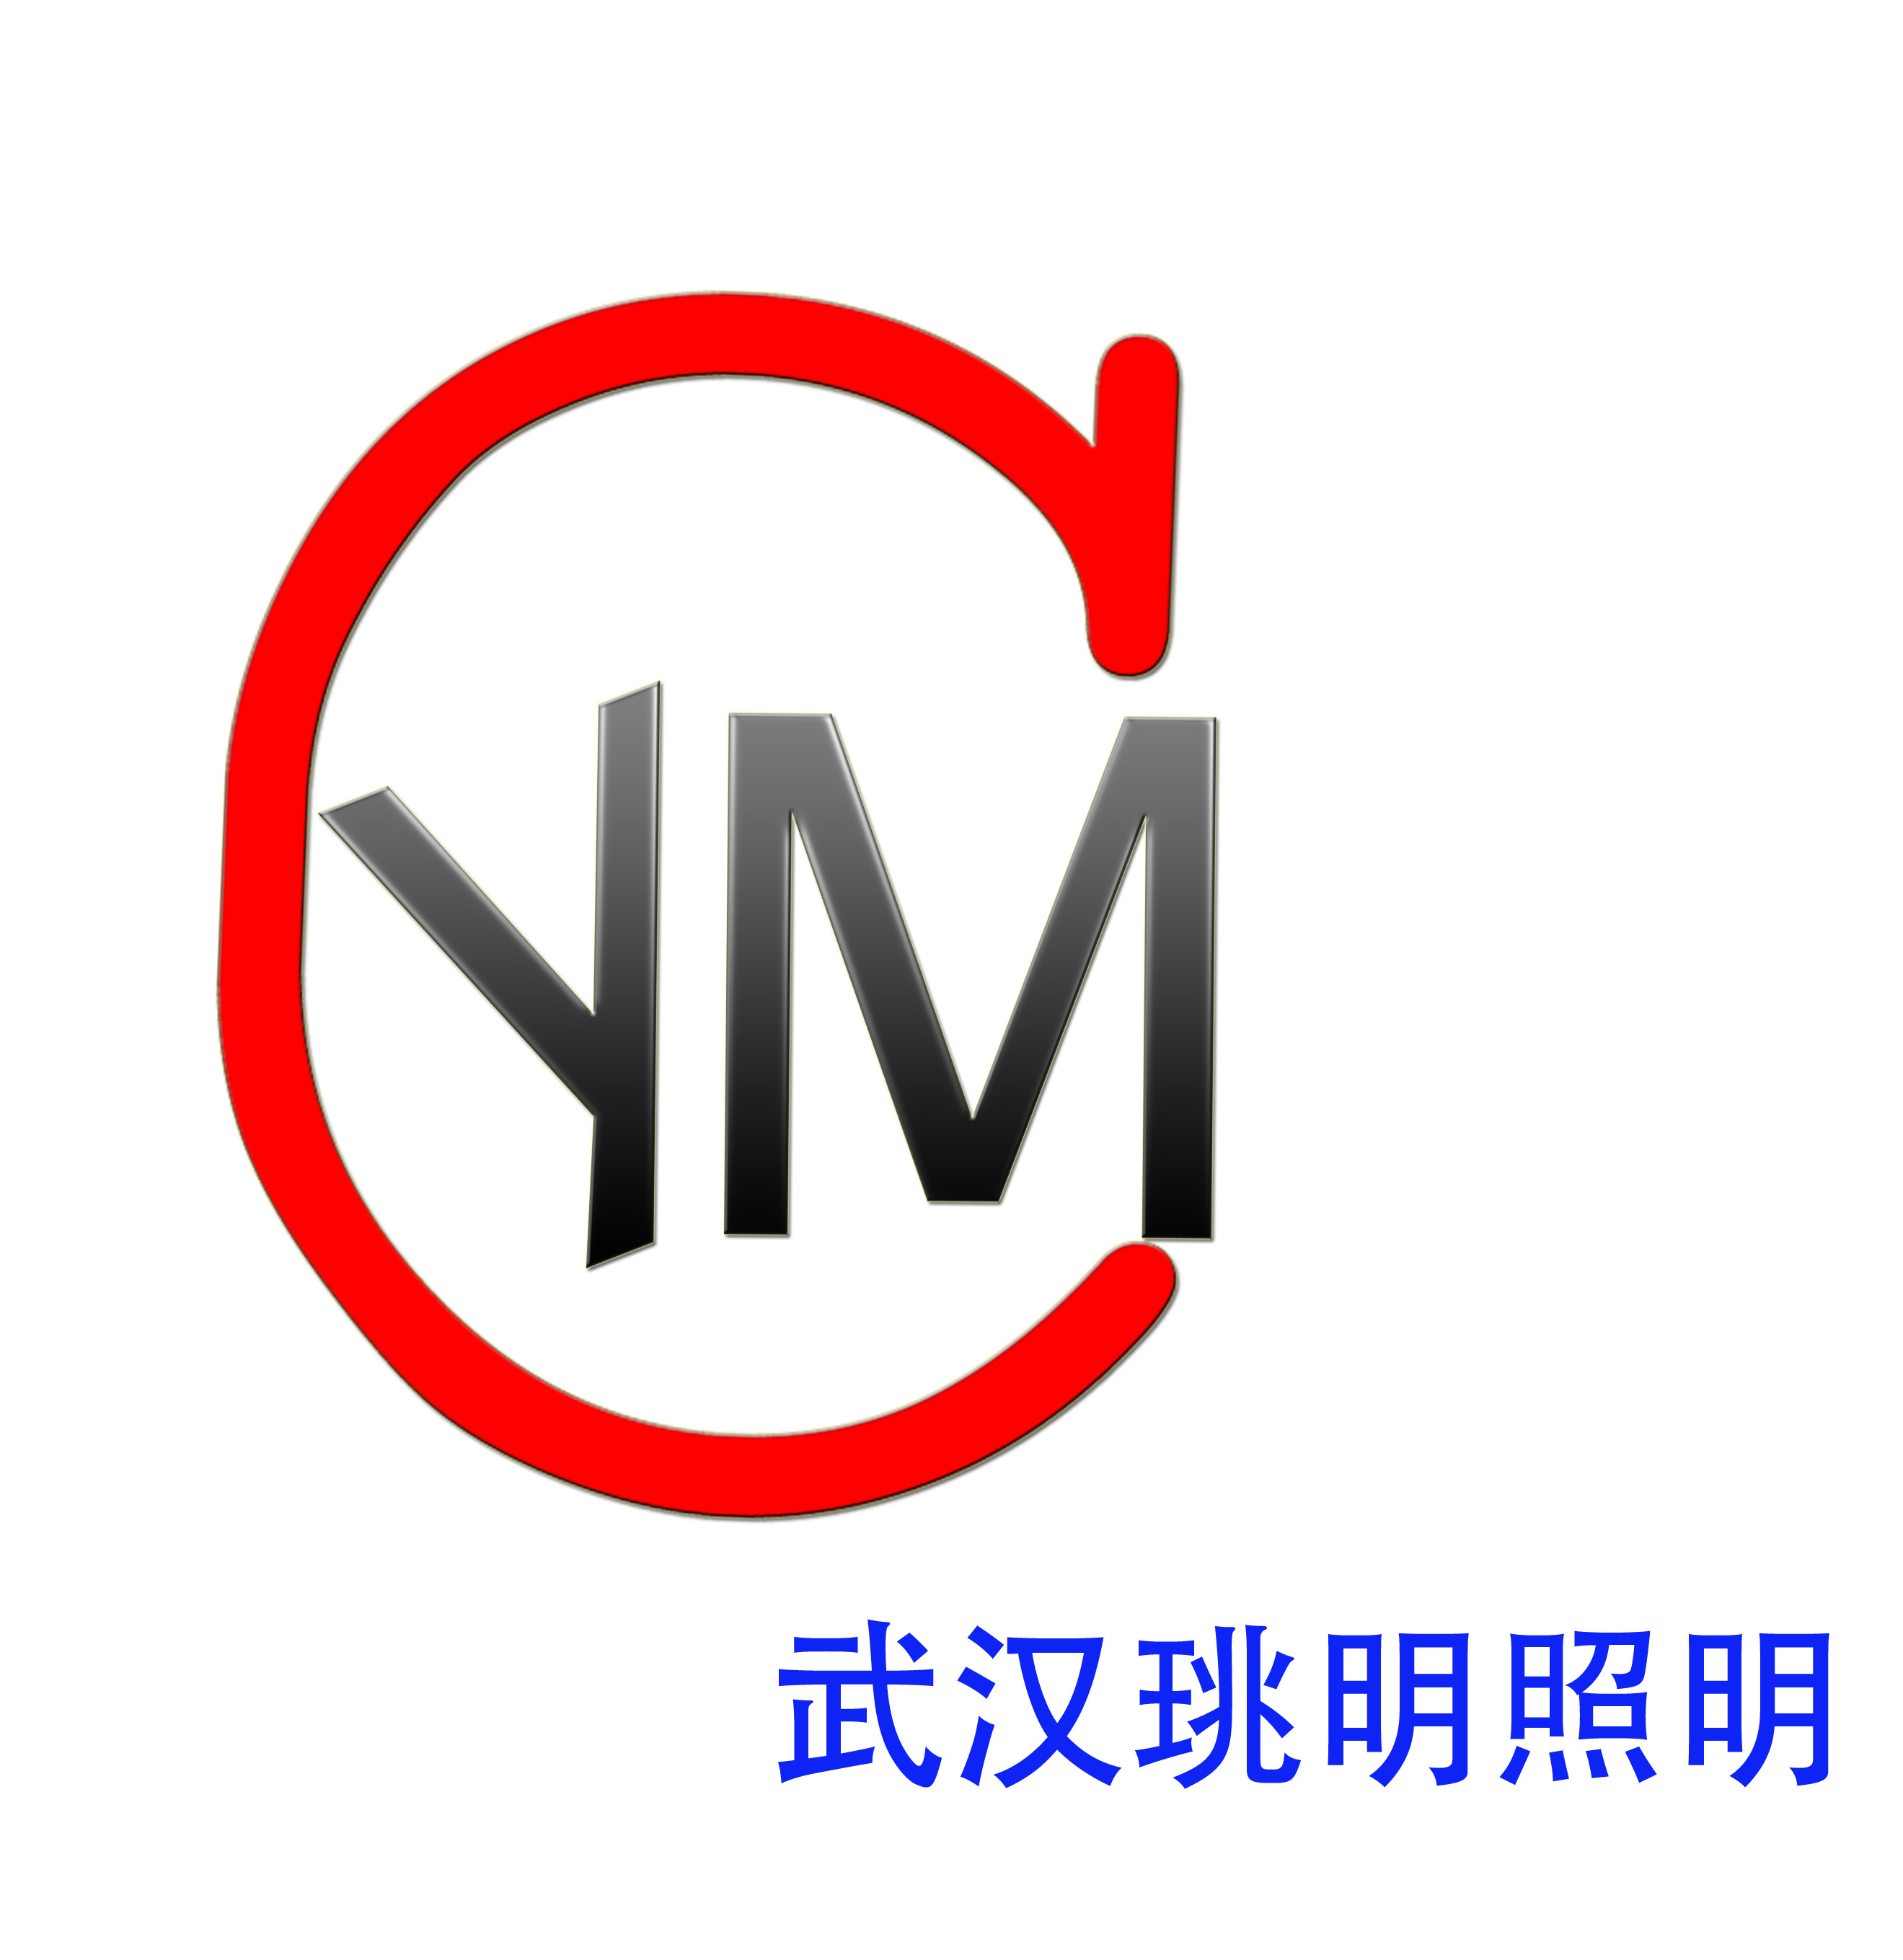 logo 标识 标志 设计 图标 2639_2718